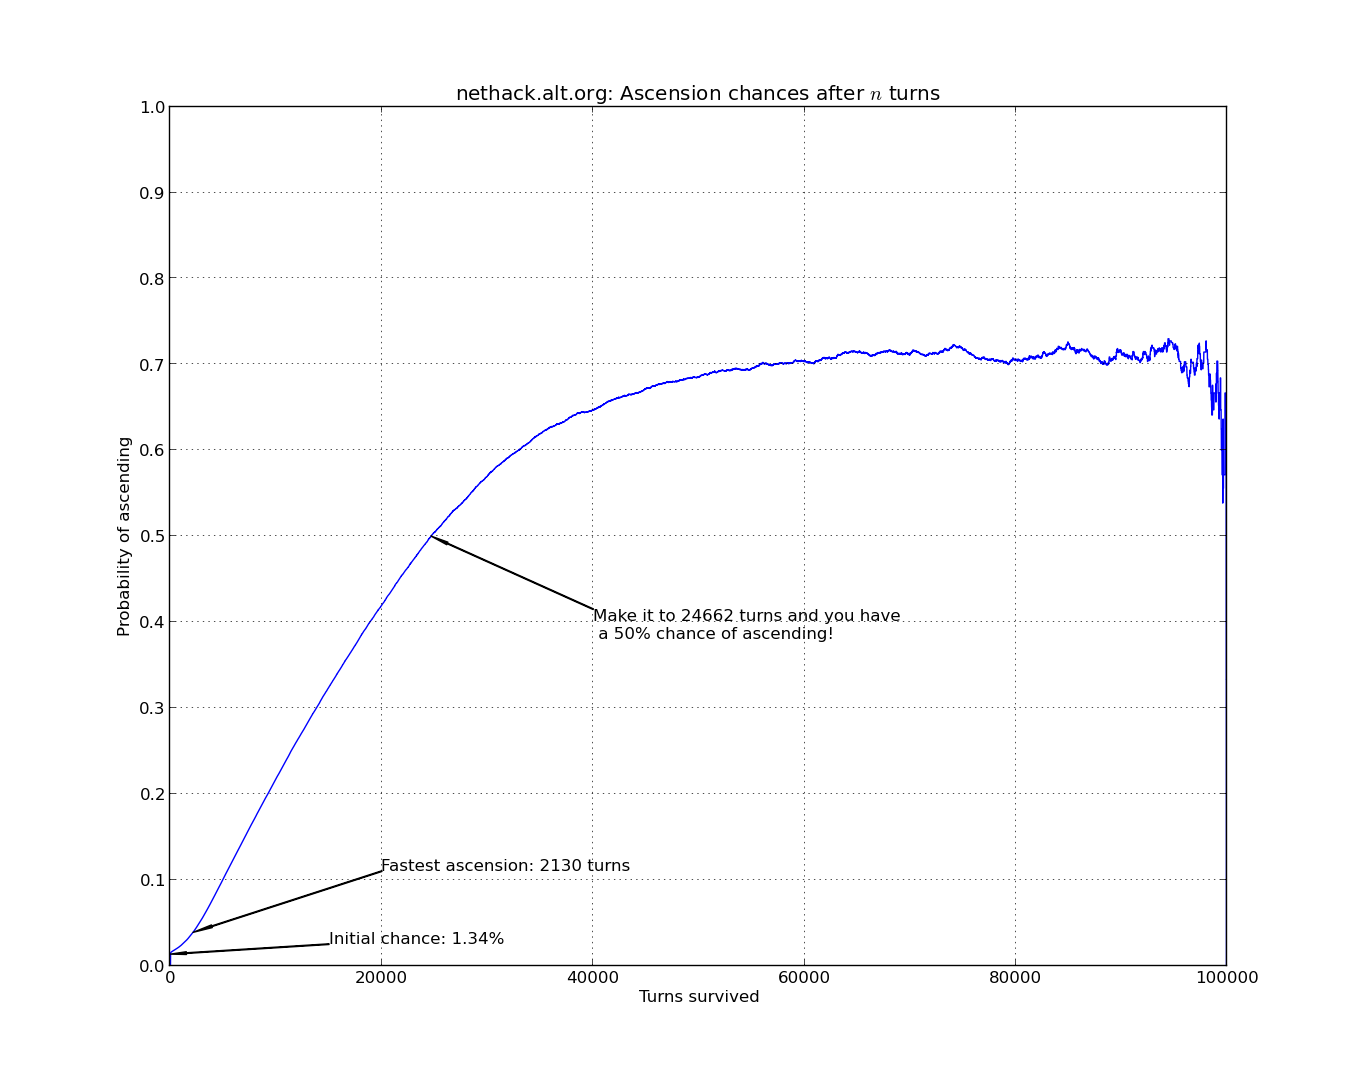 NetHack statistics